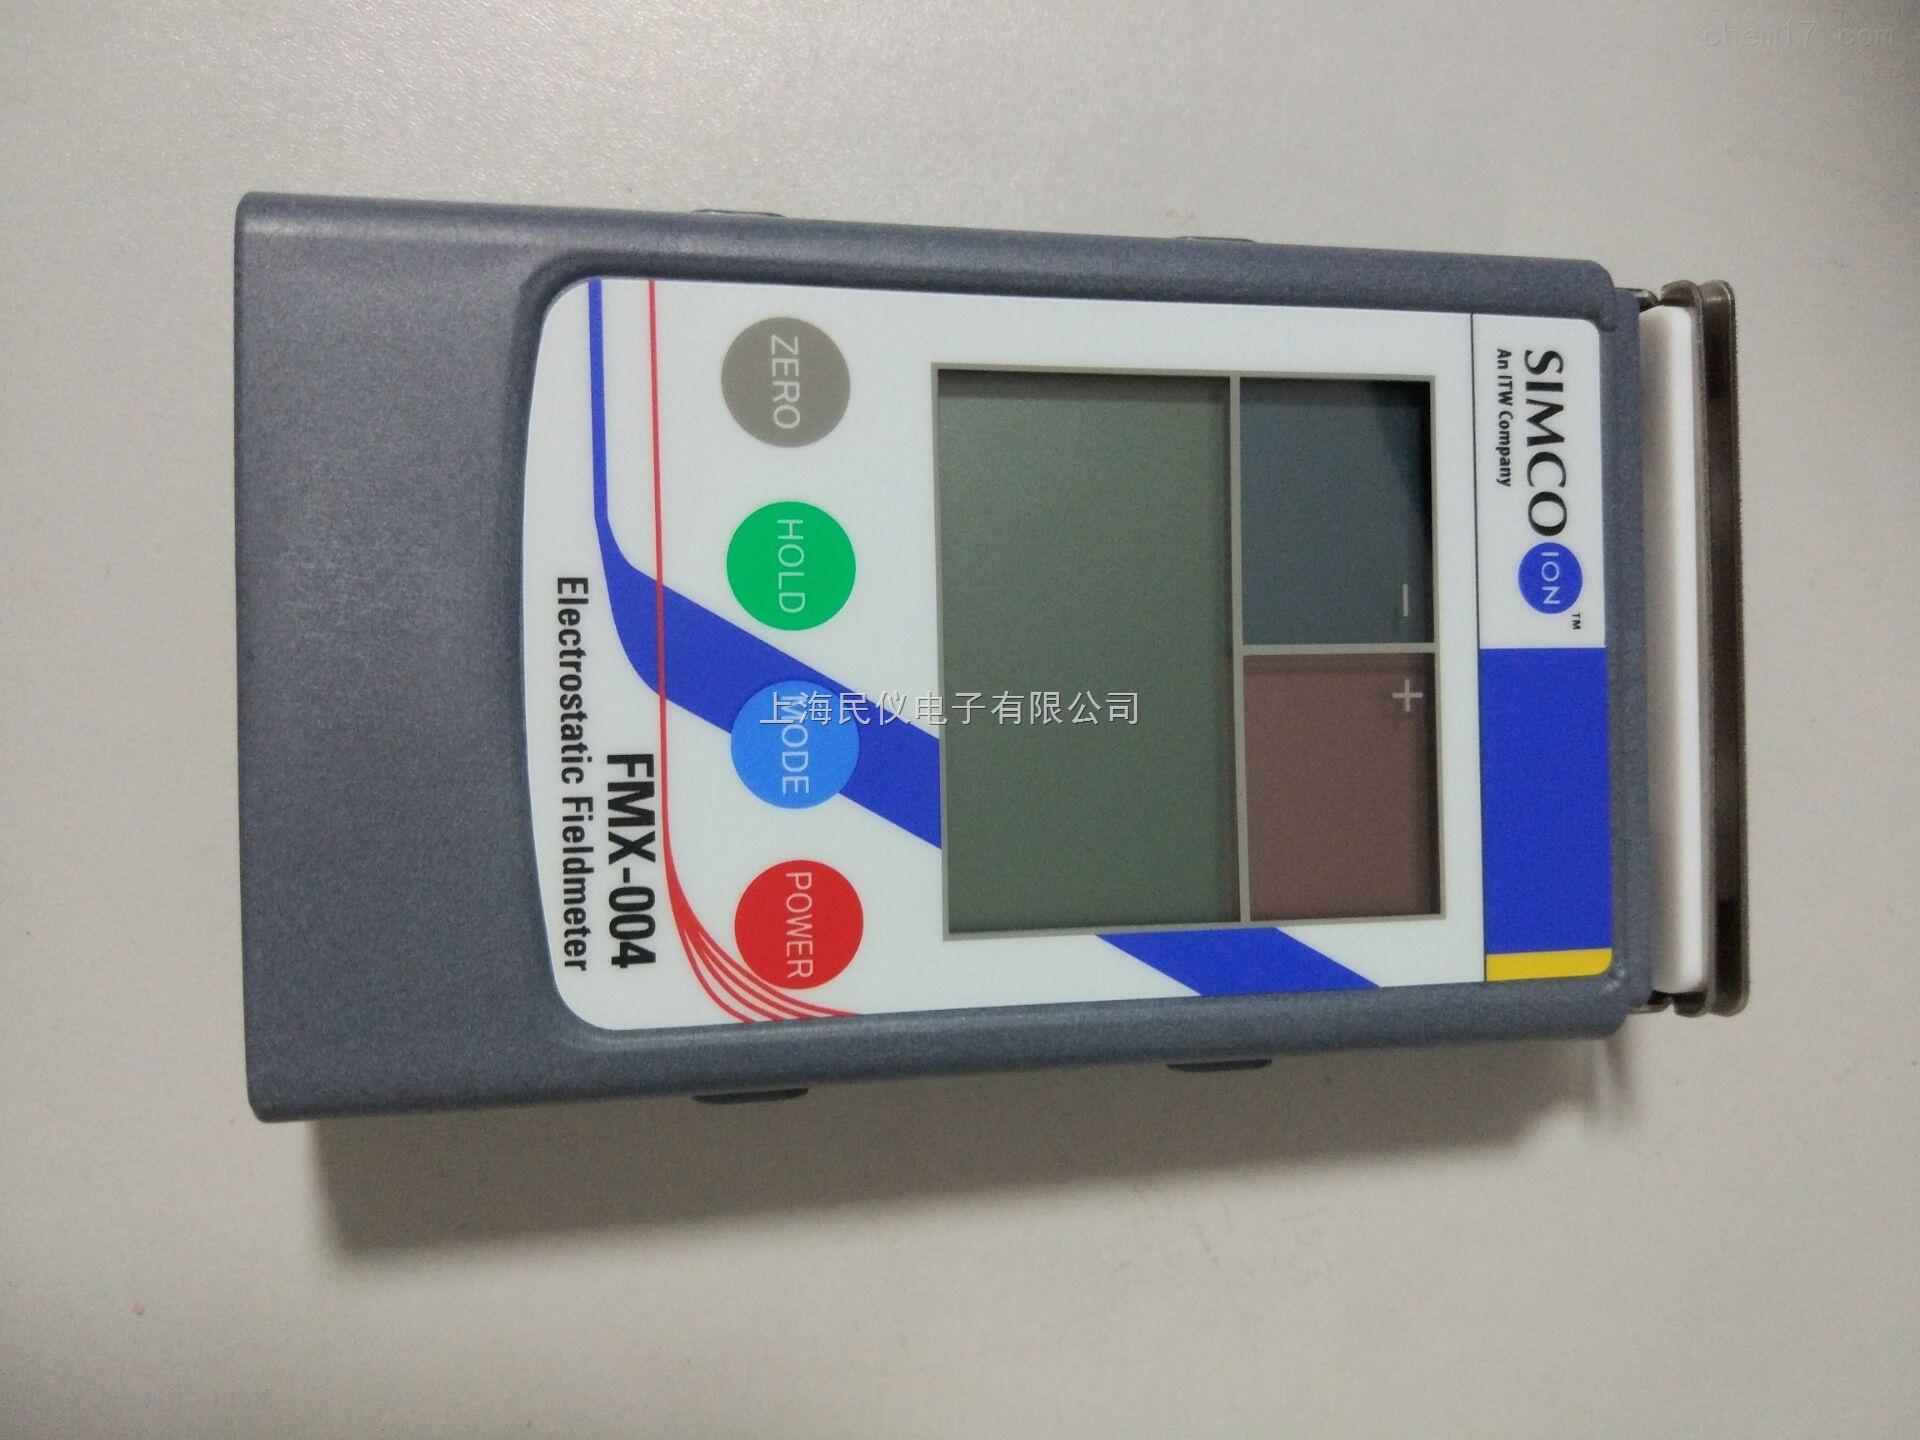 FMX-003/FMX-004美国SIMCO FMX-003/FMX-004静电测试仪